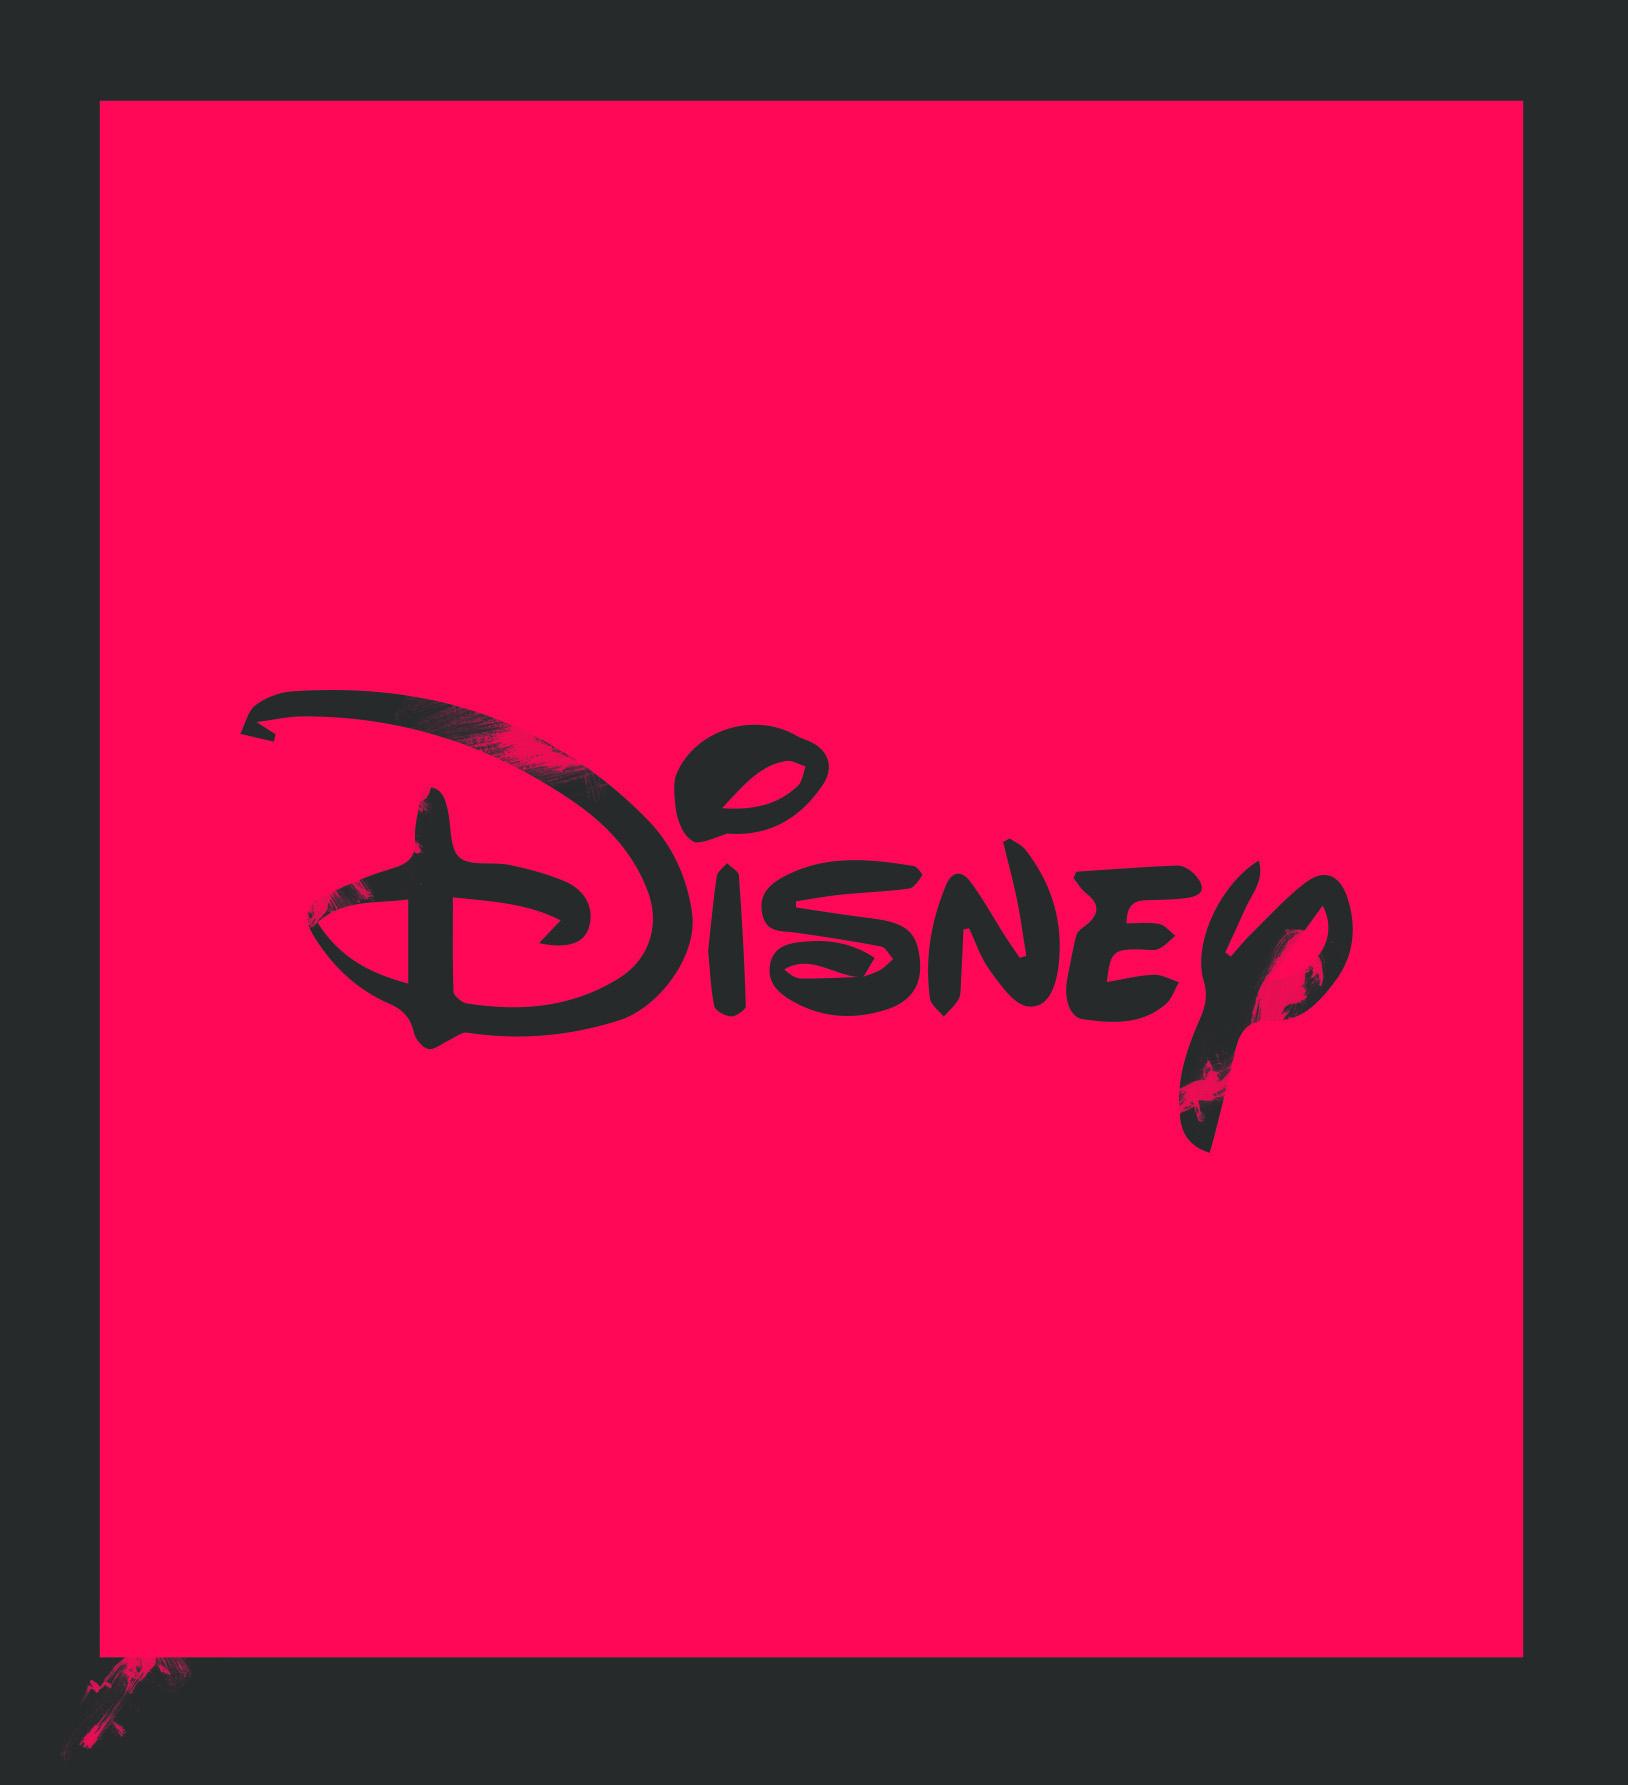 logo disney.jpg